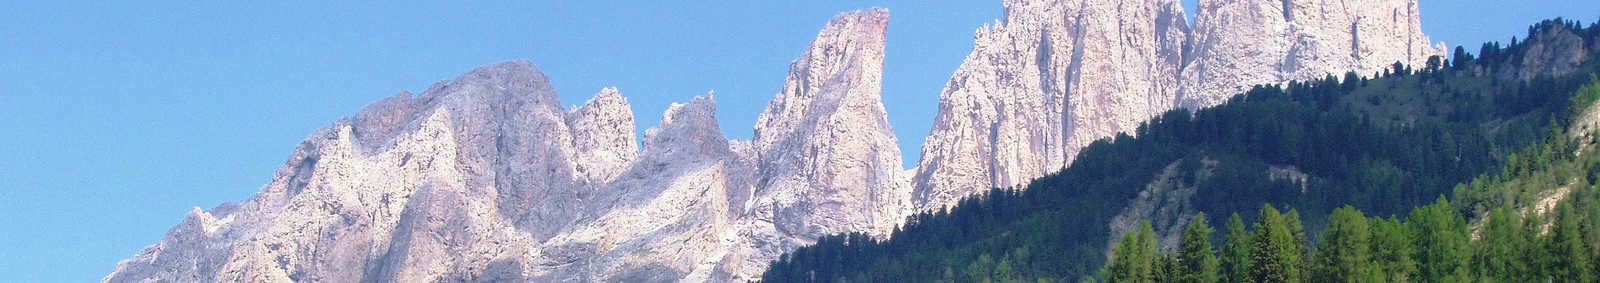 View of Soraga, Western Dolomites